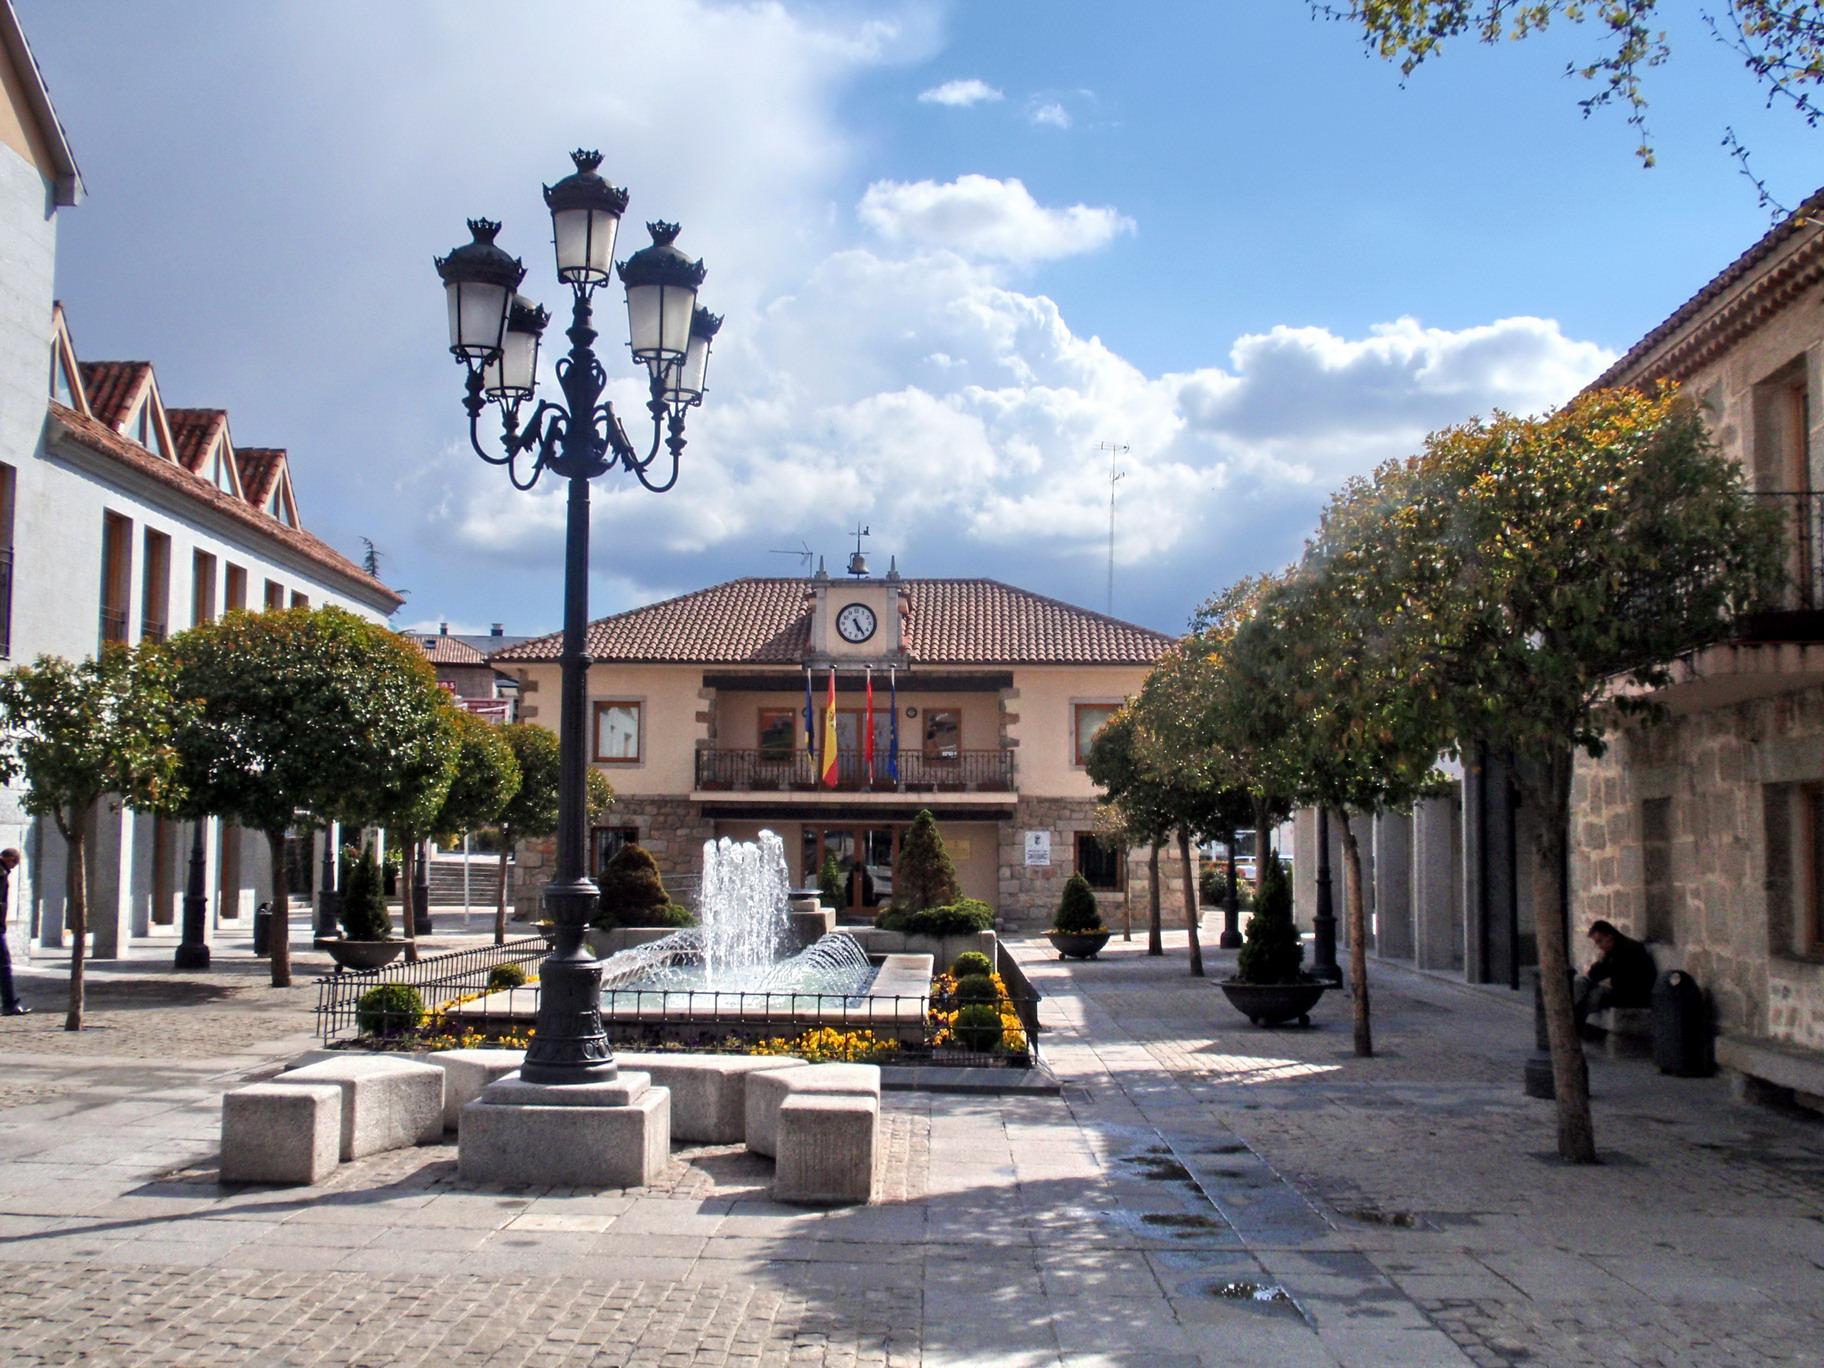 http://upload.wikimedia.org/wikipedia/commons/c/c3/Torrelodones._Plaza_de_la_Constituci%C3%B3n.jpg